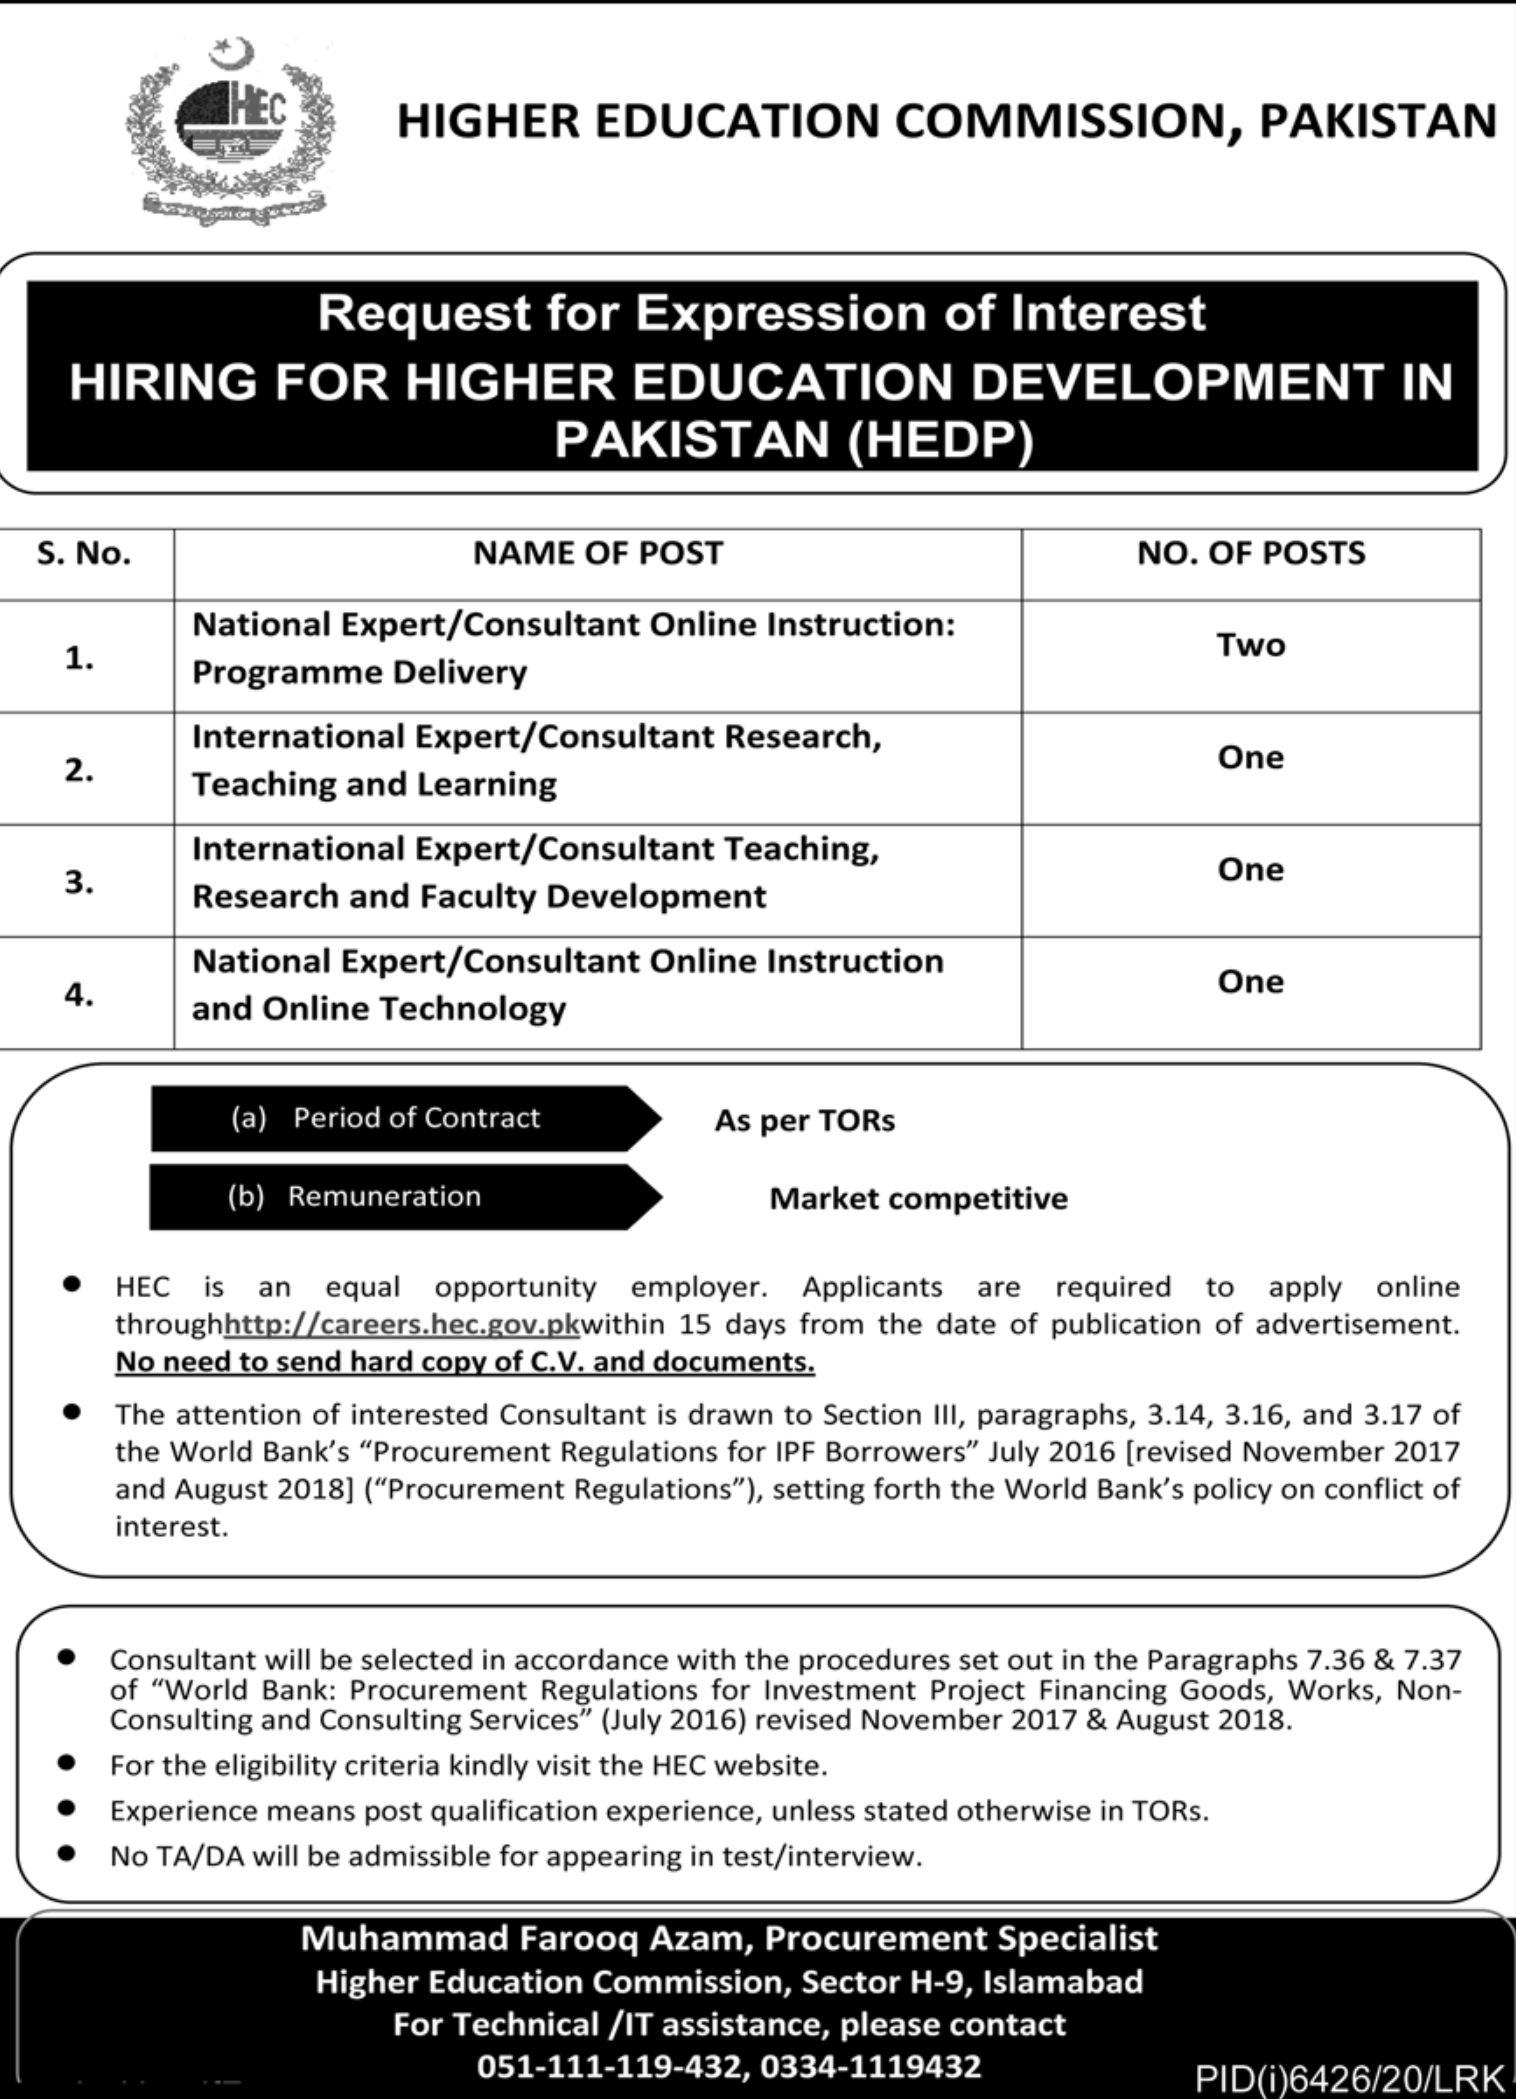 Higher Education Commission Pakistan Jobs 2021